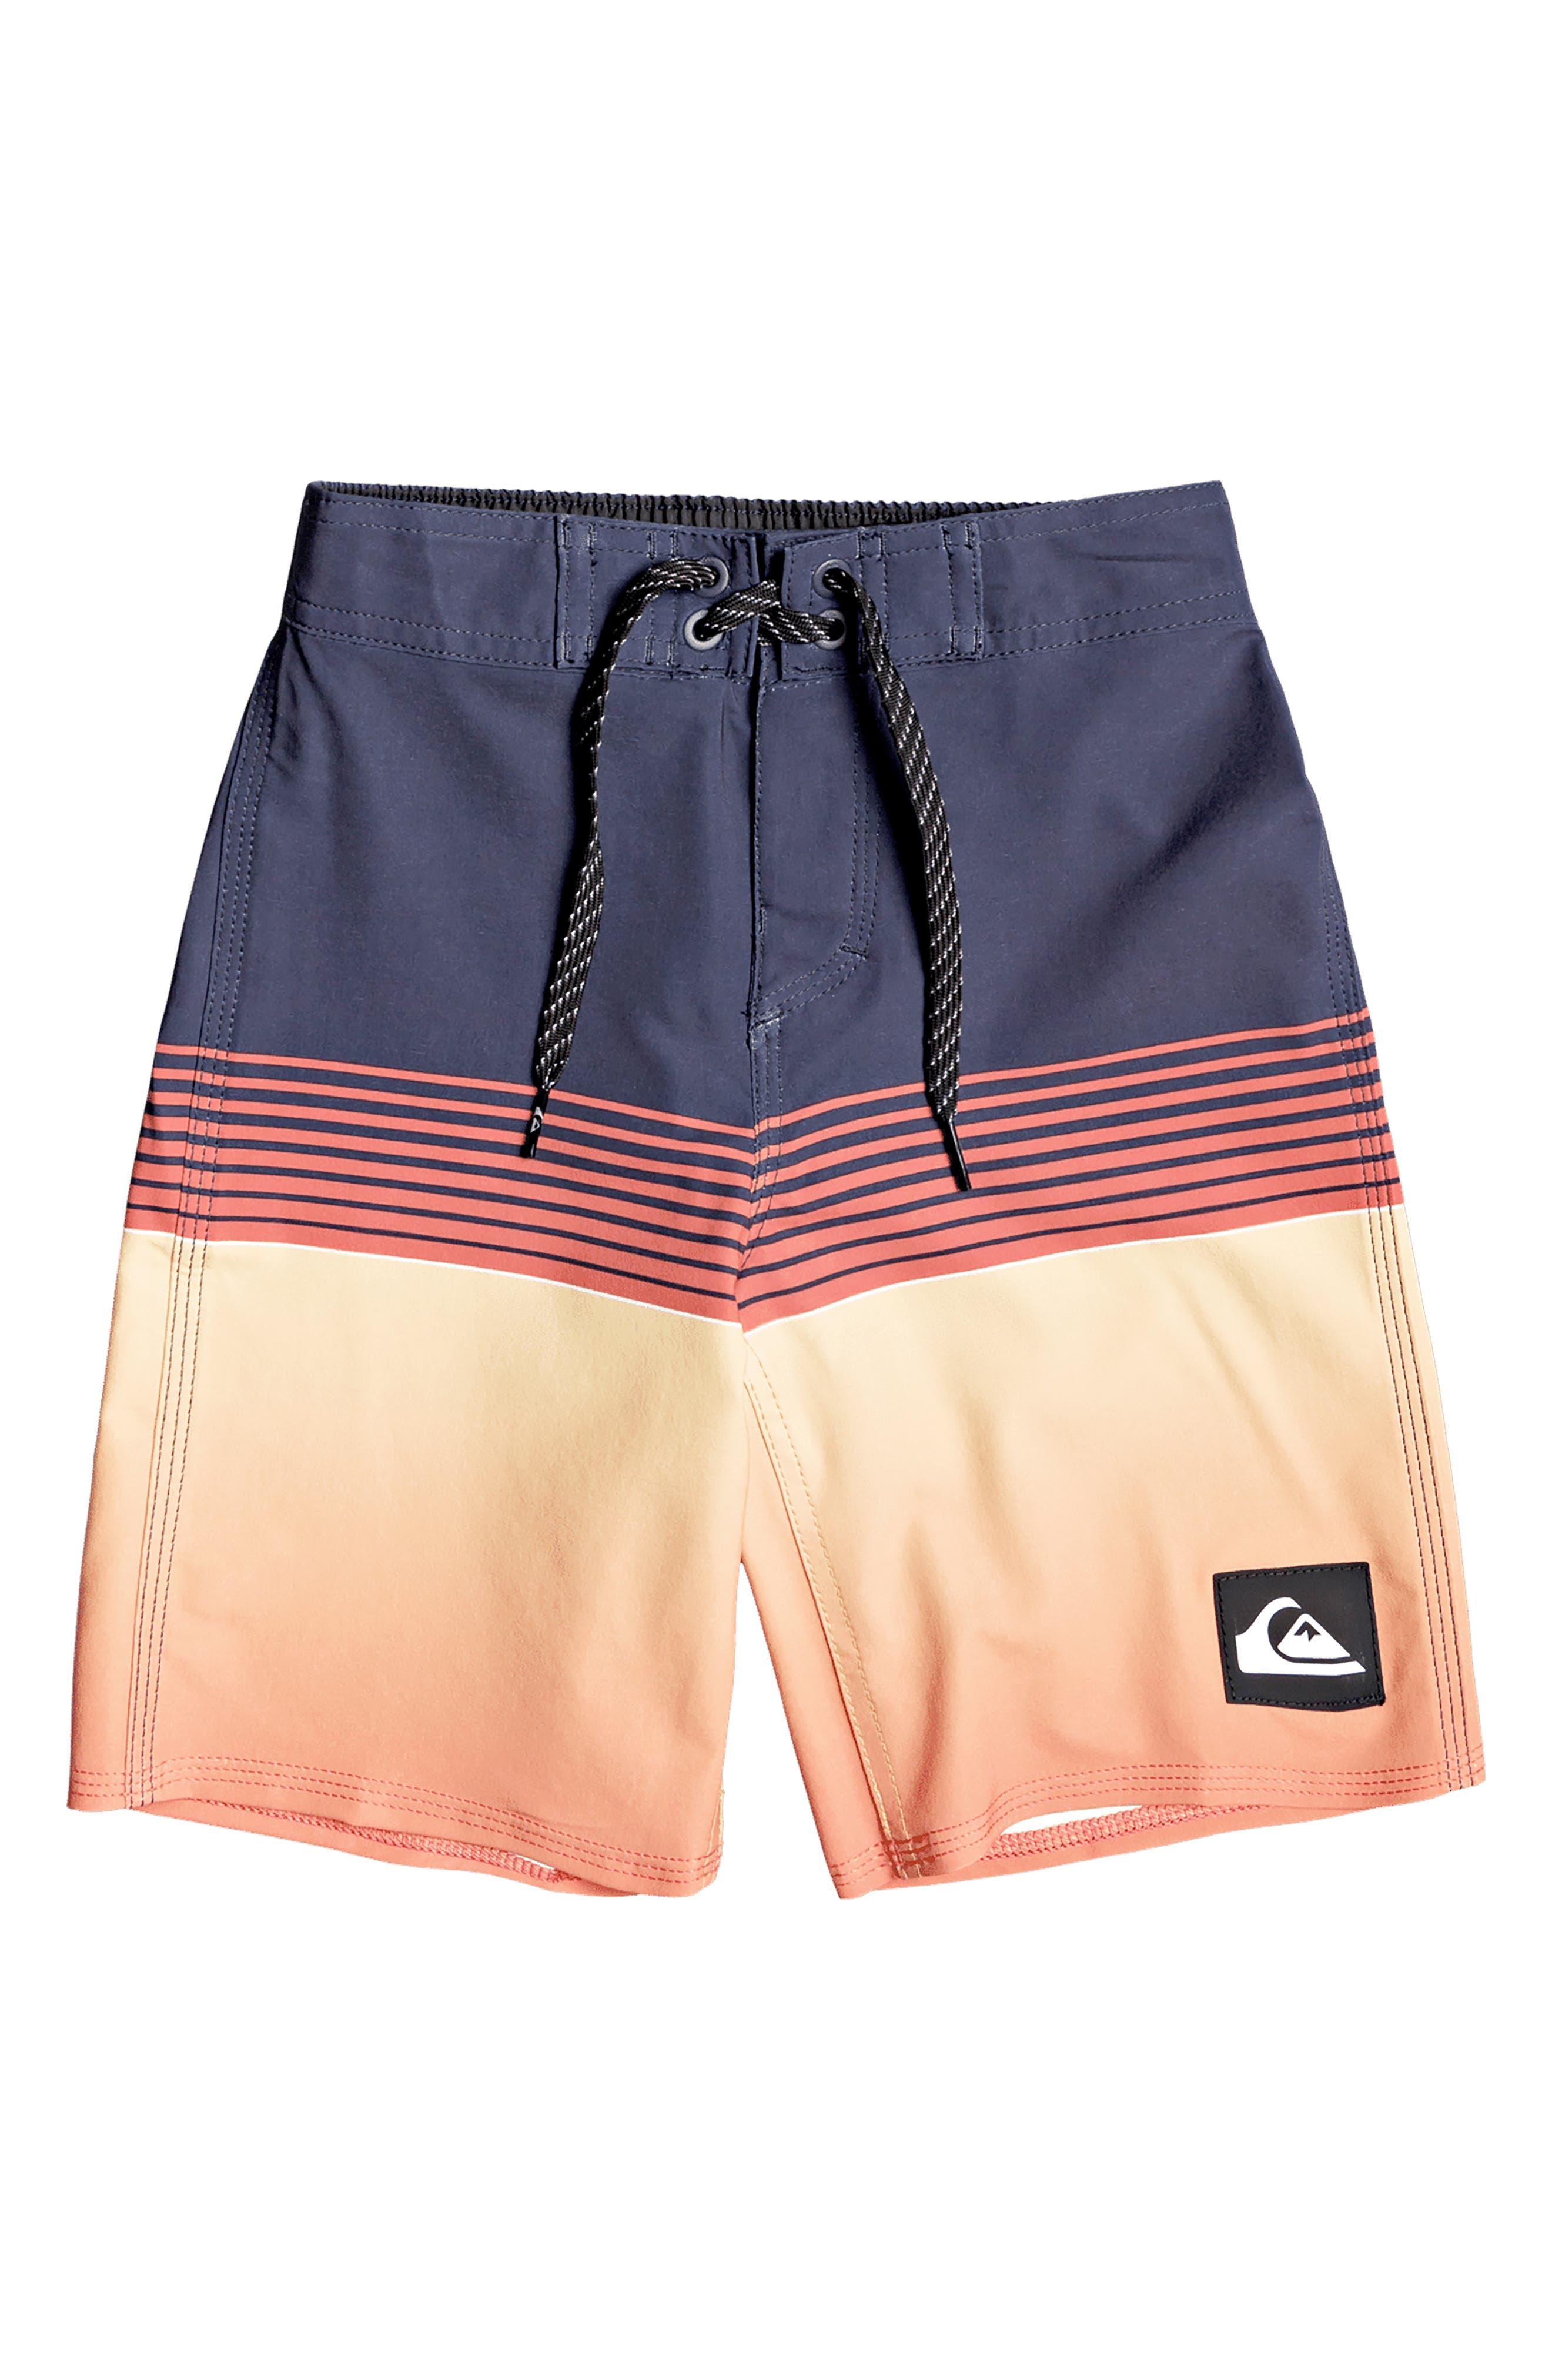 Quiksilver Boys Little Tropical Brush Volley 14 Boardshort Swim Trunk